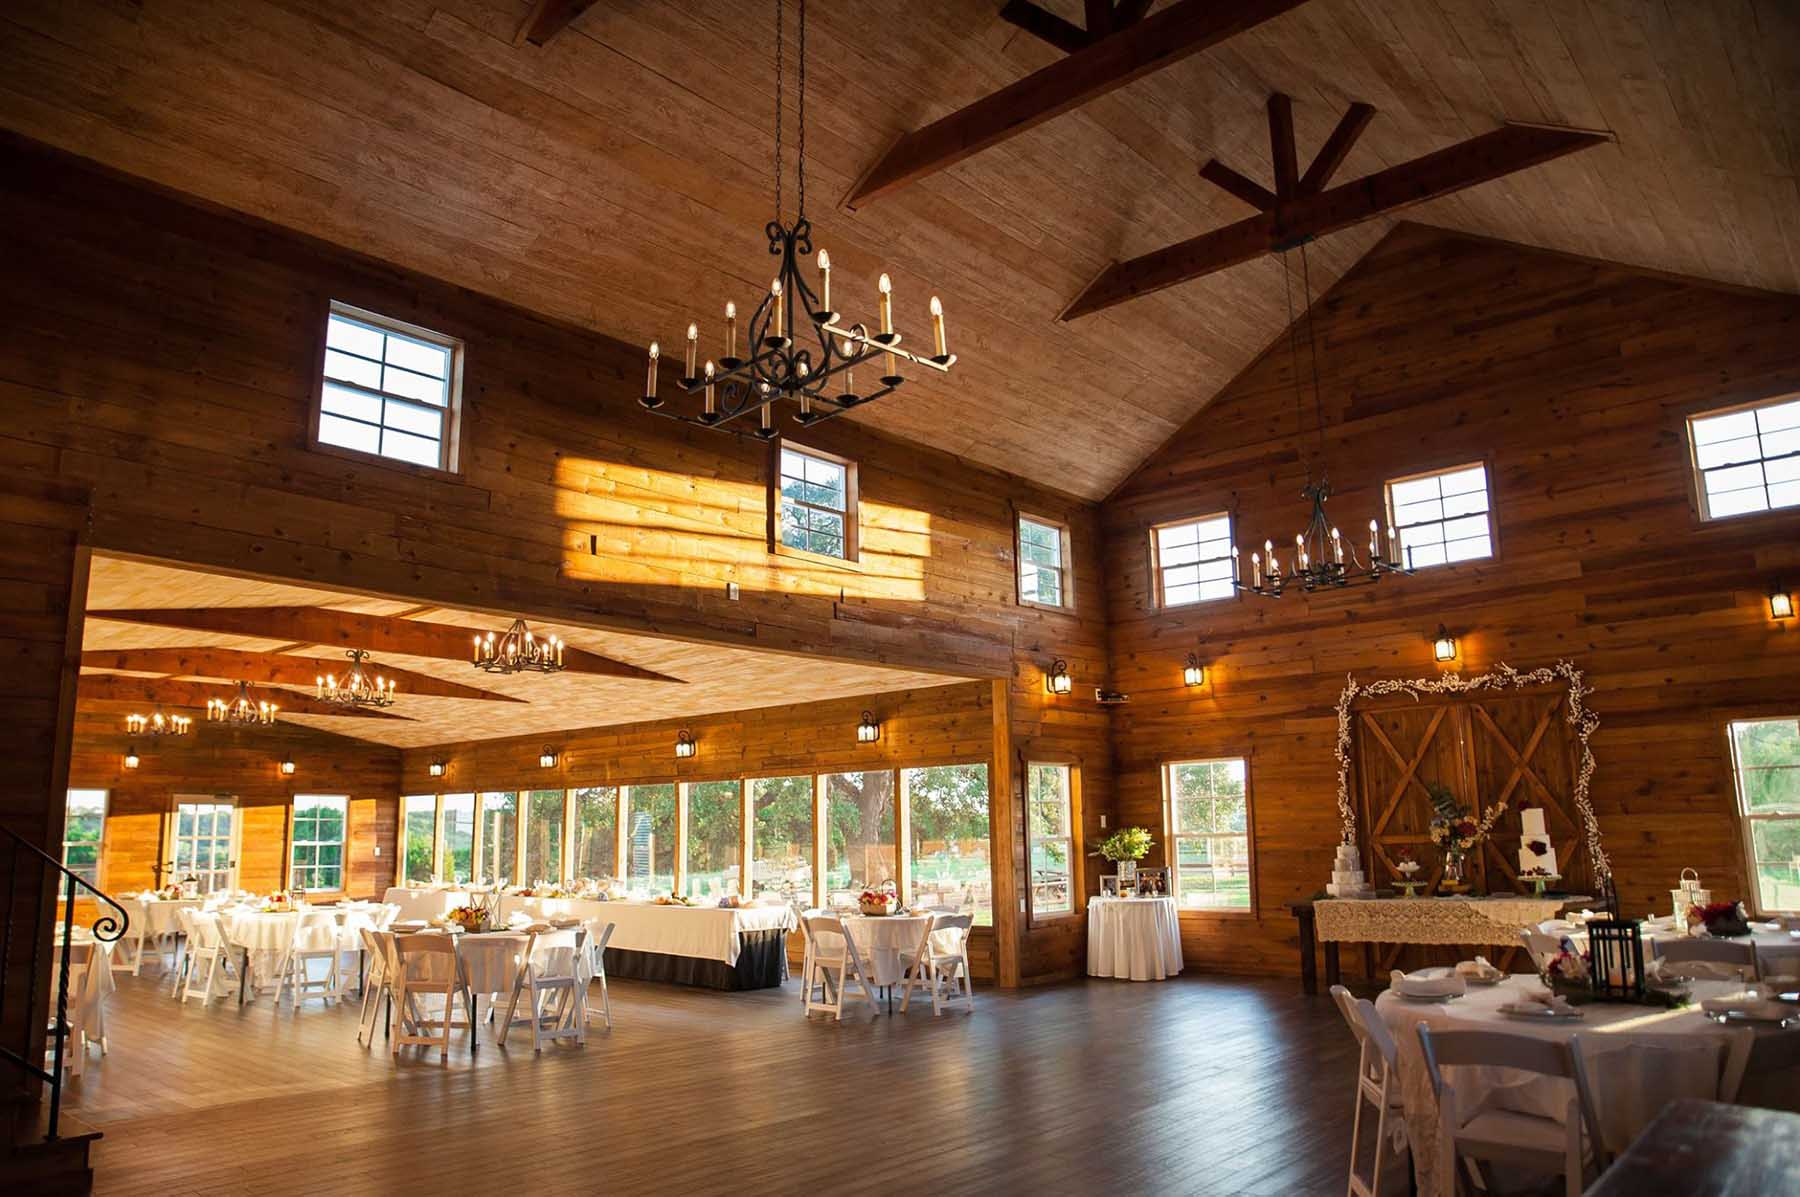 Wedding & Event Venue in Dripping Springs, TX | Wedding ...